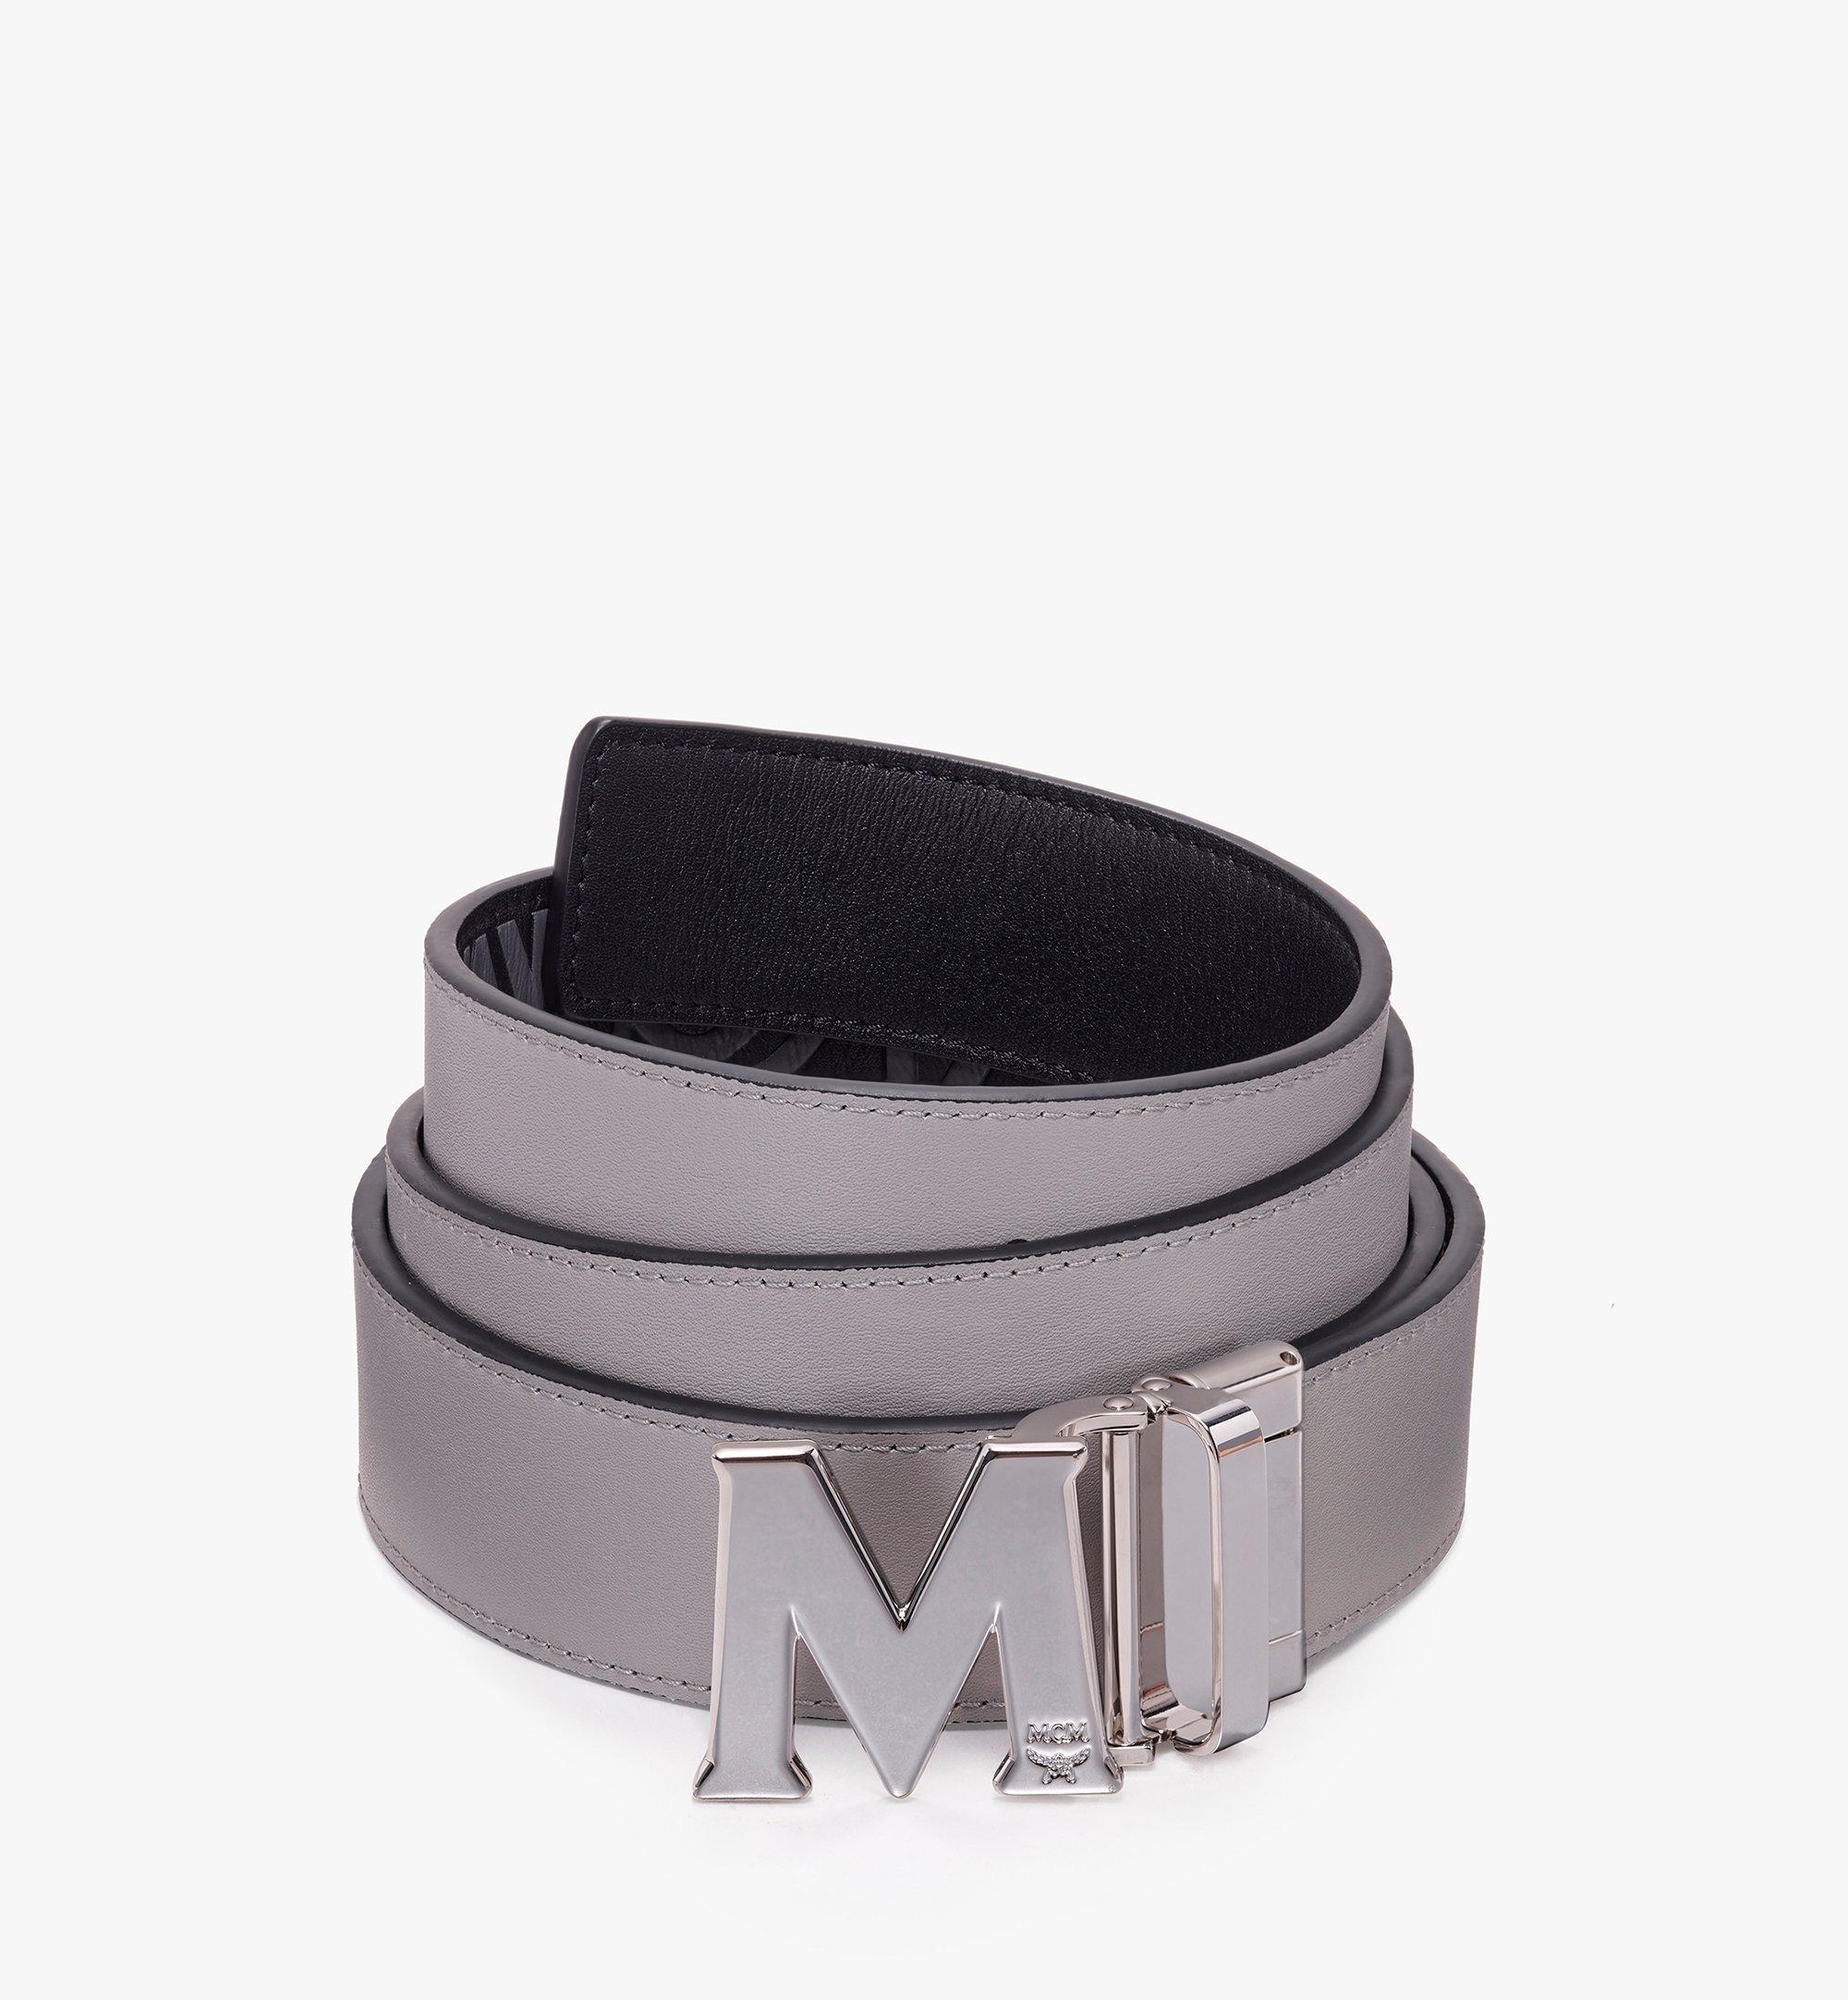 MCM Claus Flat M Reversible Belt in Visetos Black MXB9AVI46BK001 Alternate View 1